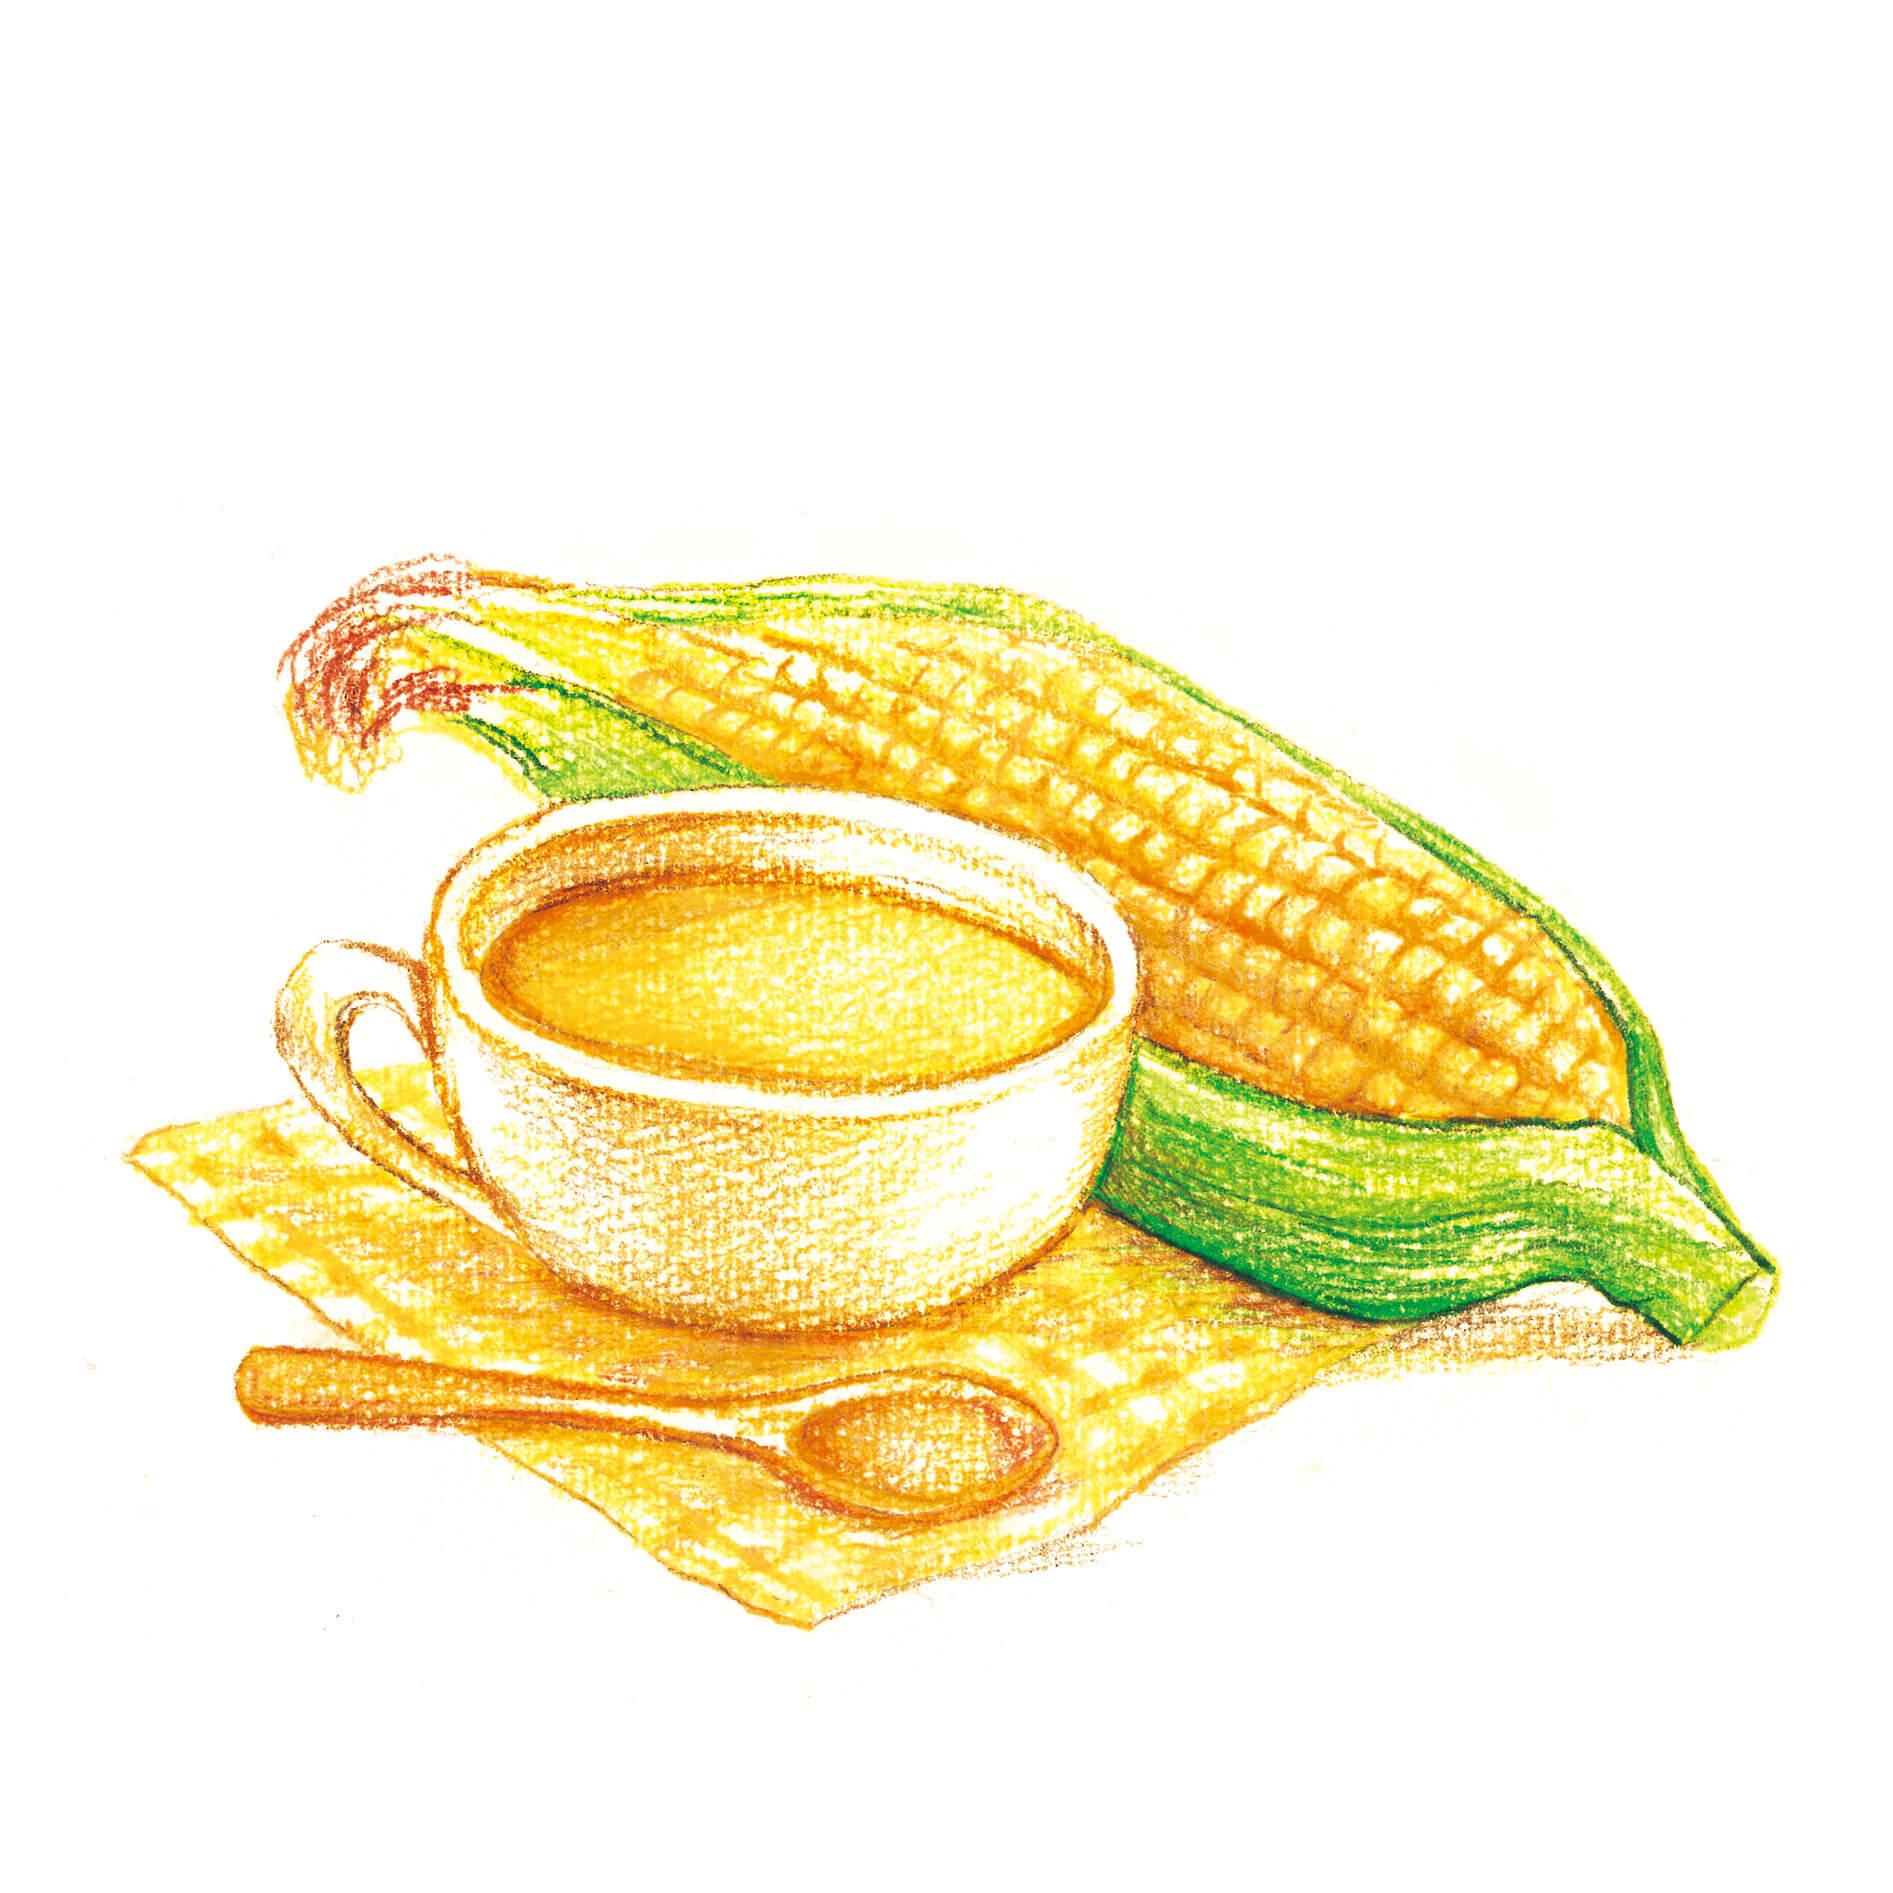 cornpotage